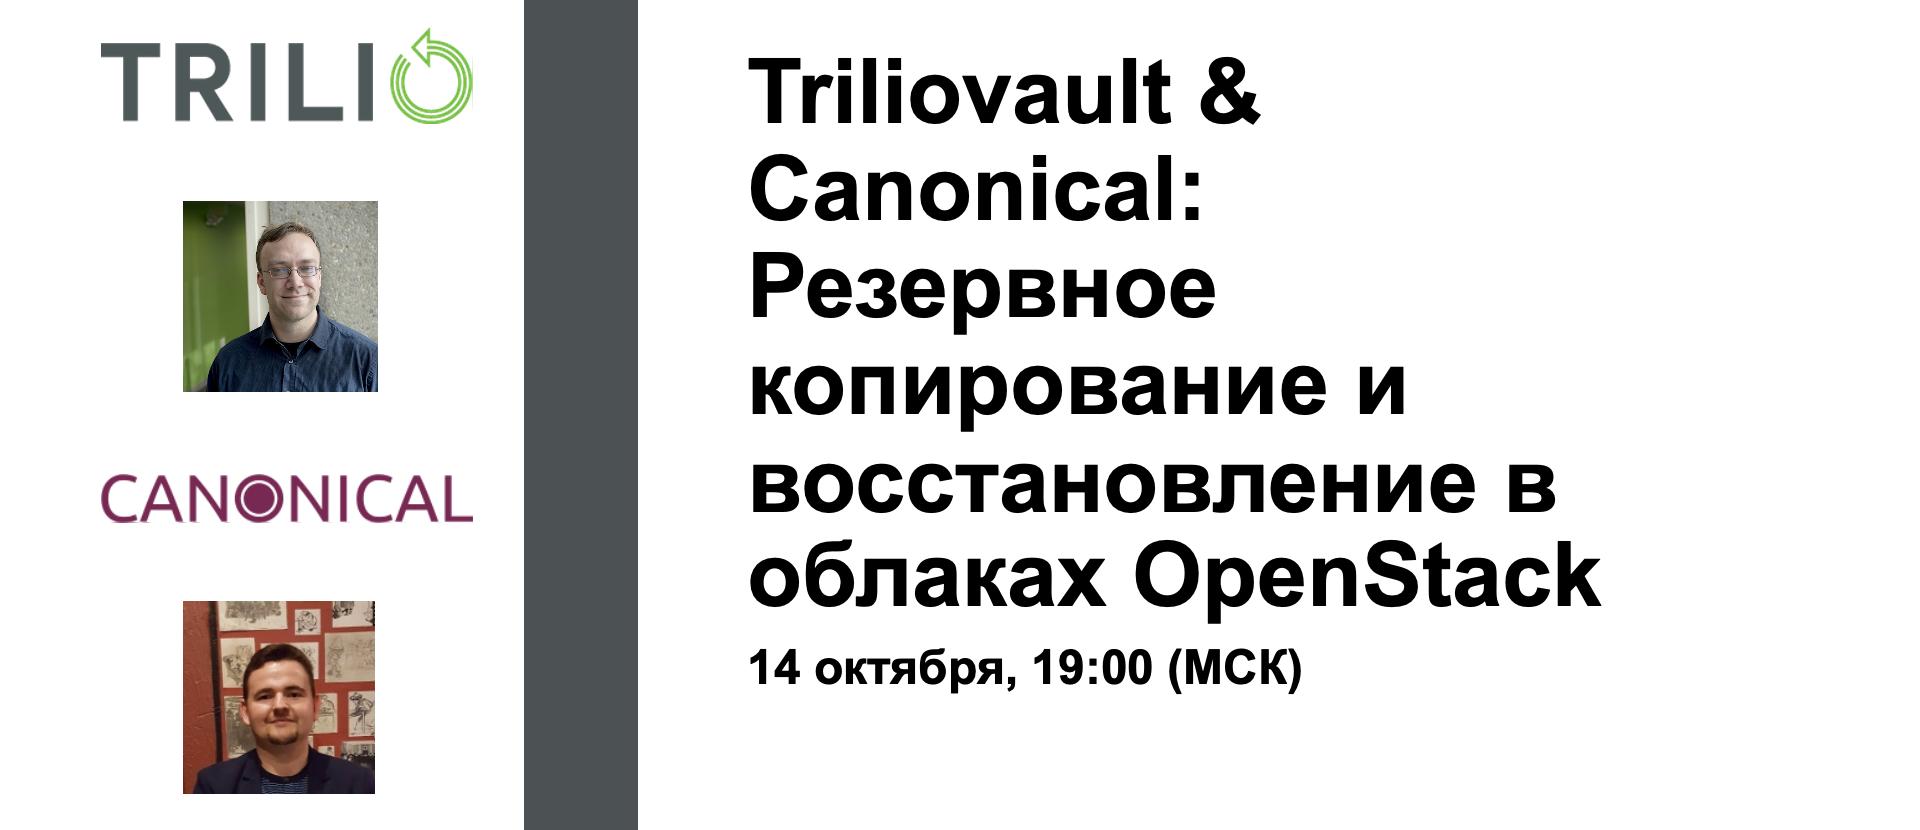 Trilio & Canonical for Cloud Openstack